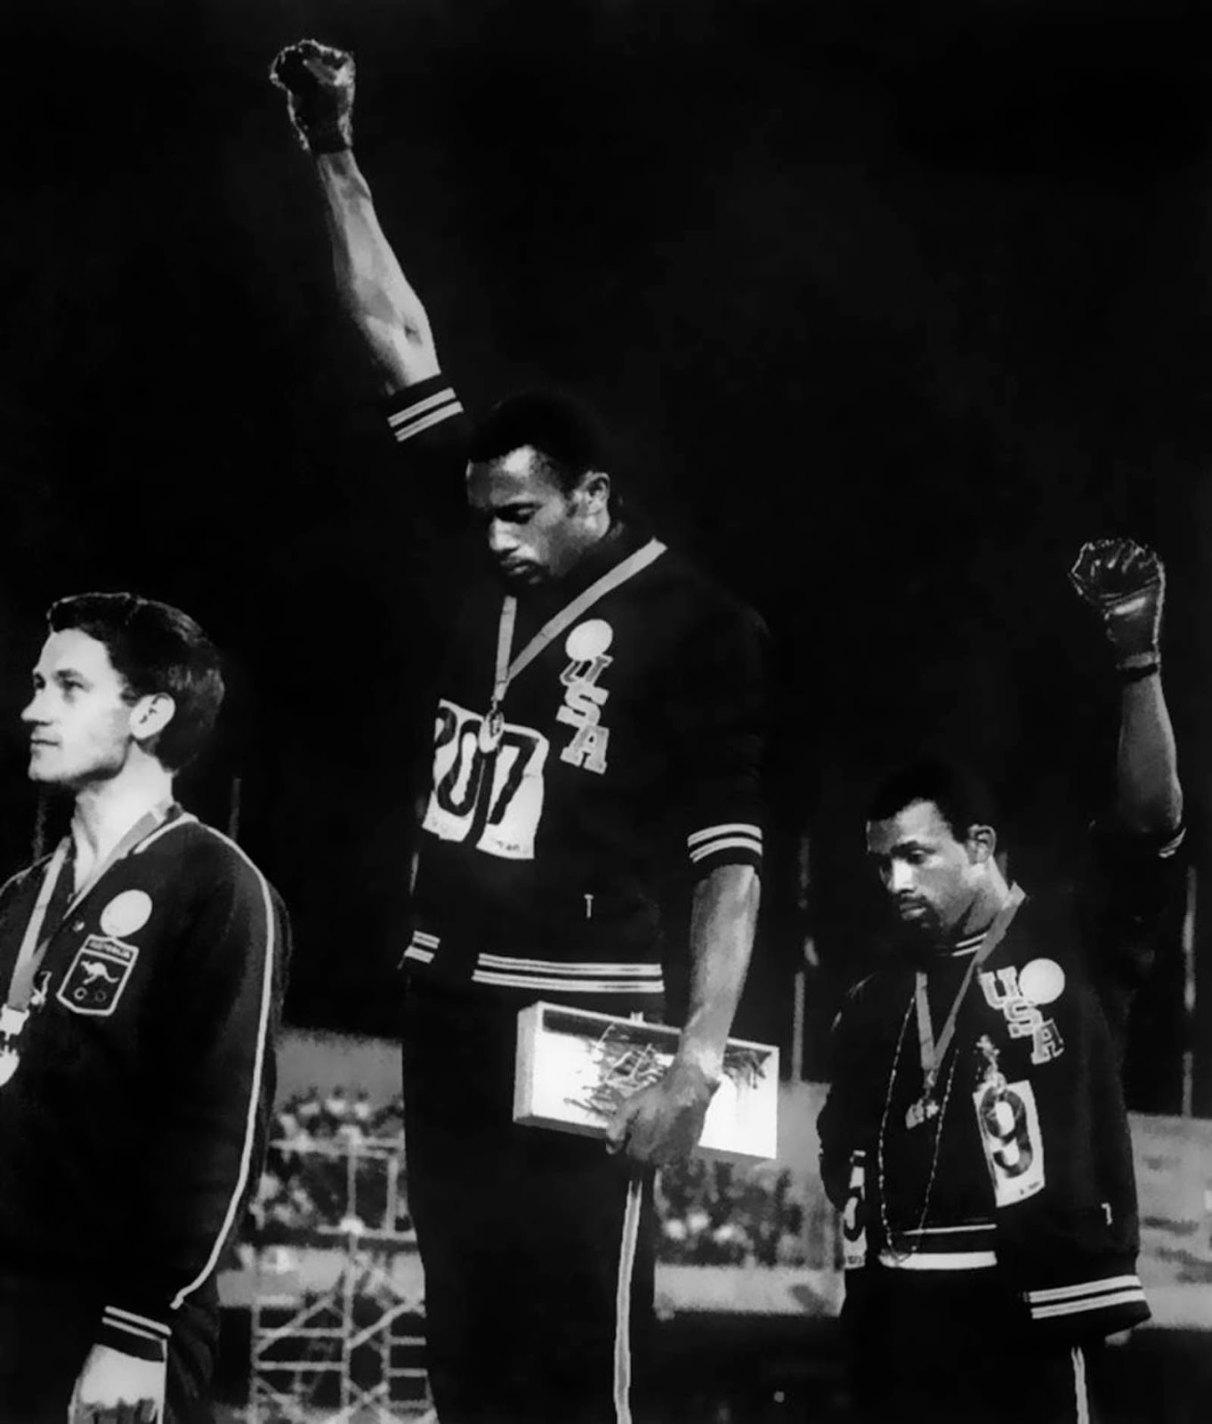 Black Power Salute, John Dominis, 1968